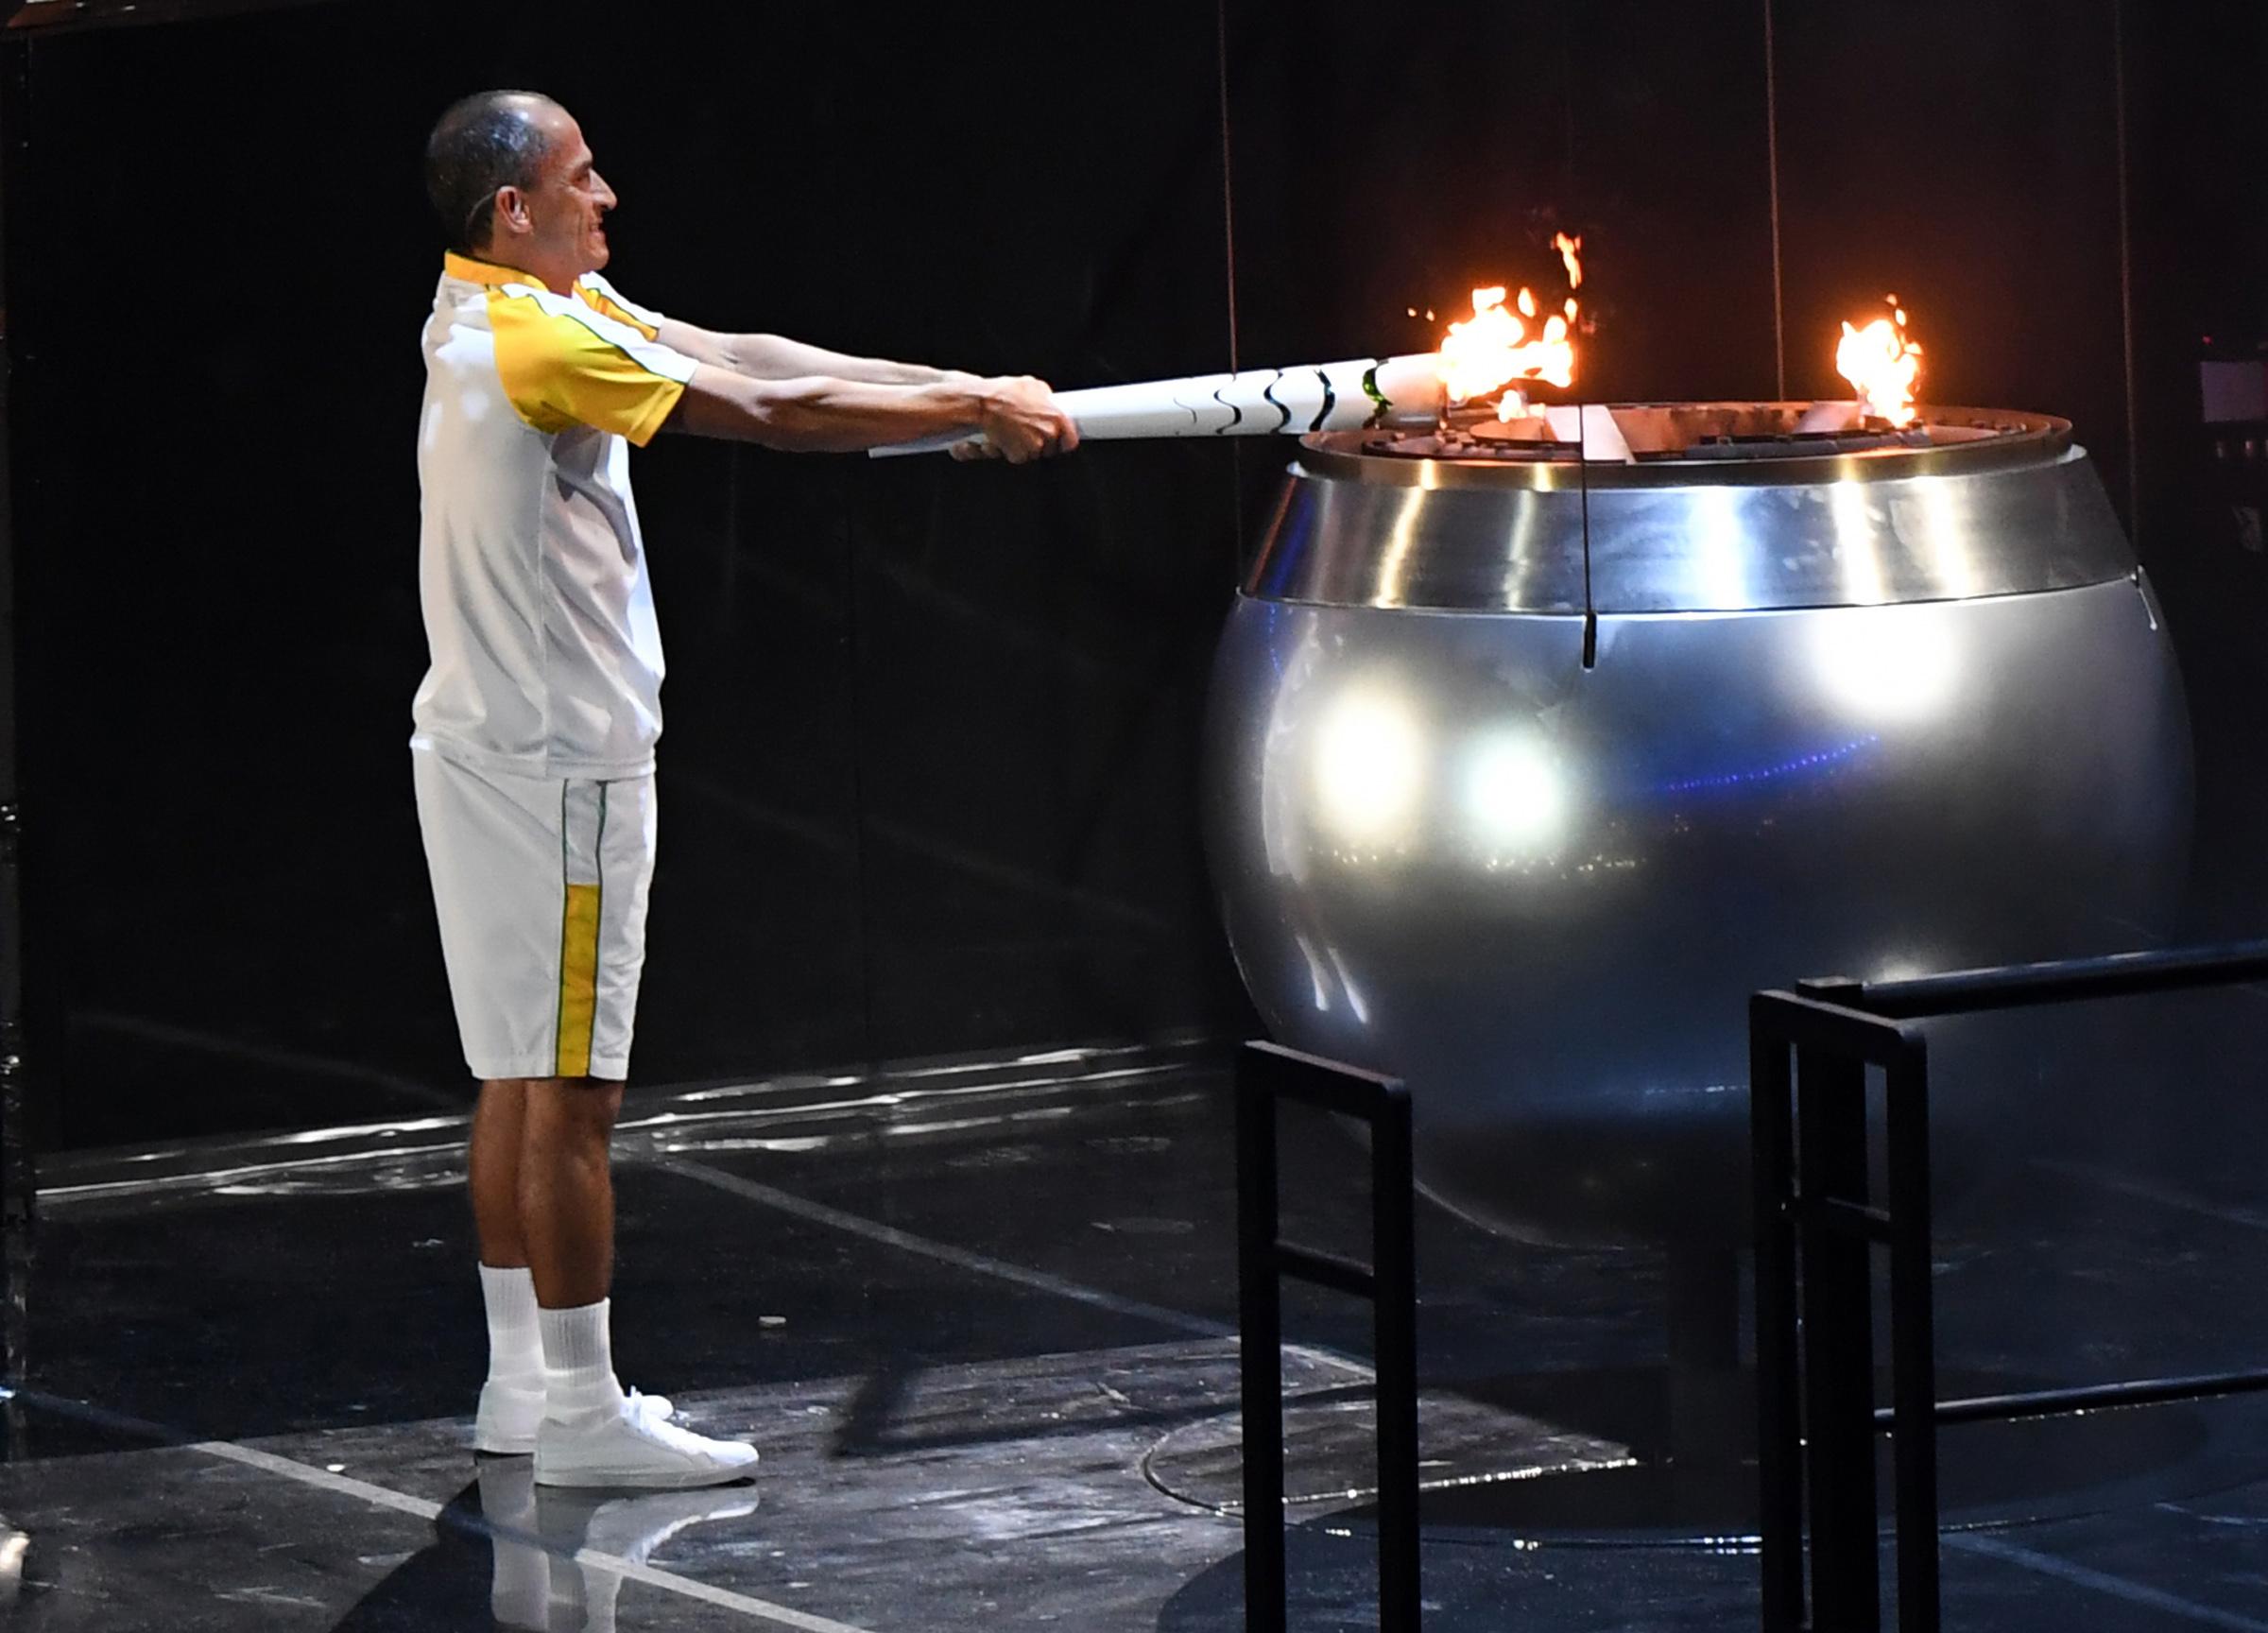 Vanderlei Cordeiro de Lima lights the Olympic cauldron during the Opening Ceremony of the 2016 Rio Olympic Games at Maracana Stadium in Rio de Janeiro, Brazil. U.S. Army photo by Tim Hipps, IMCOM Public Affairs.